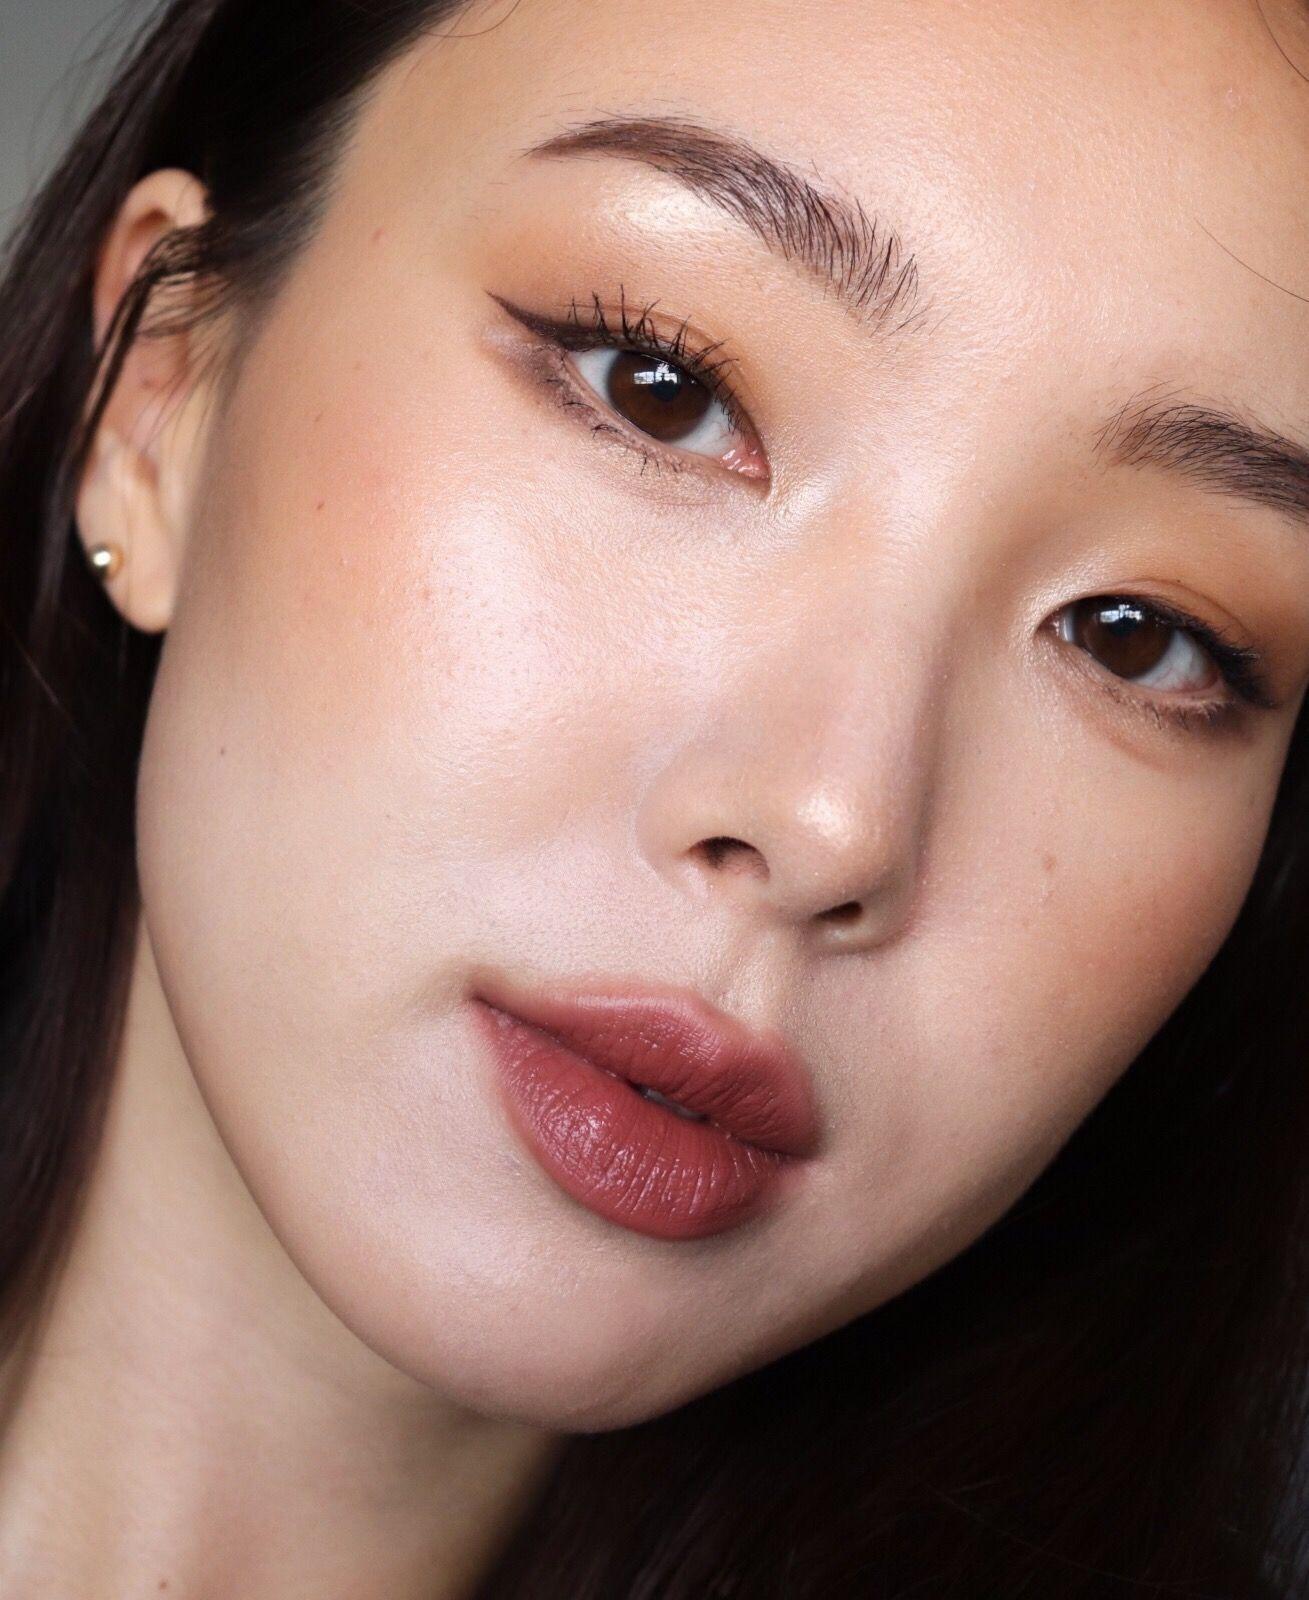 Korean Koreanmakeup Beauty Motd Makeup Fall Fallmakeup Kbeauty Asiatisches Makeup Koreanisches Make Up Einfaches Makeup